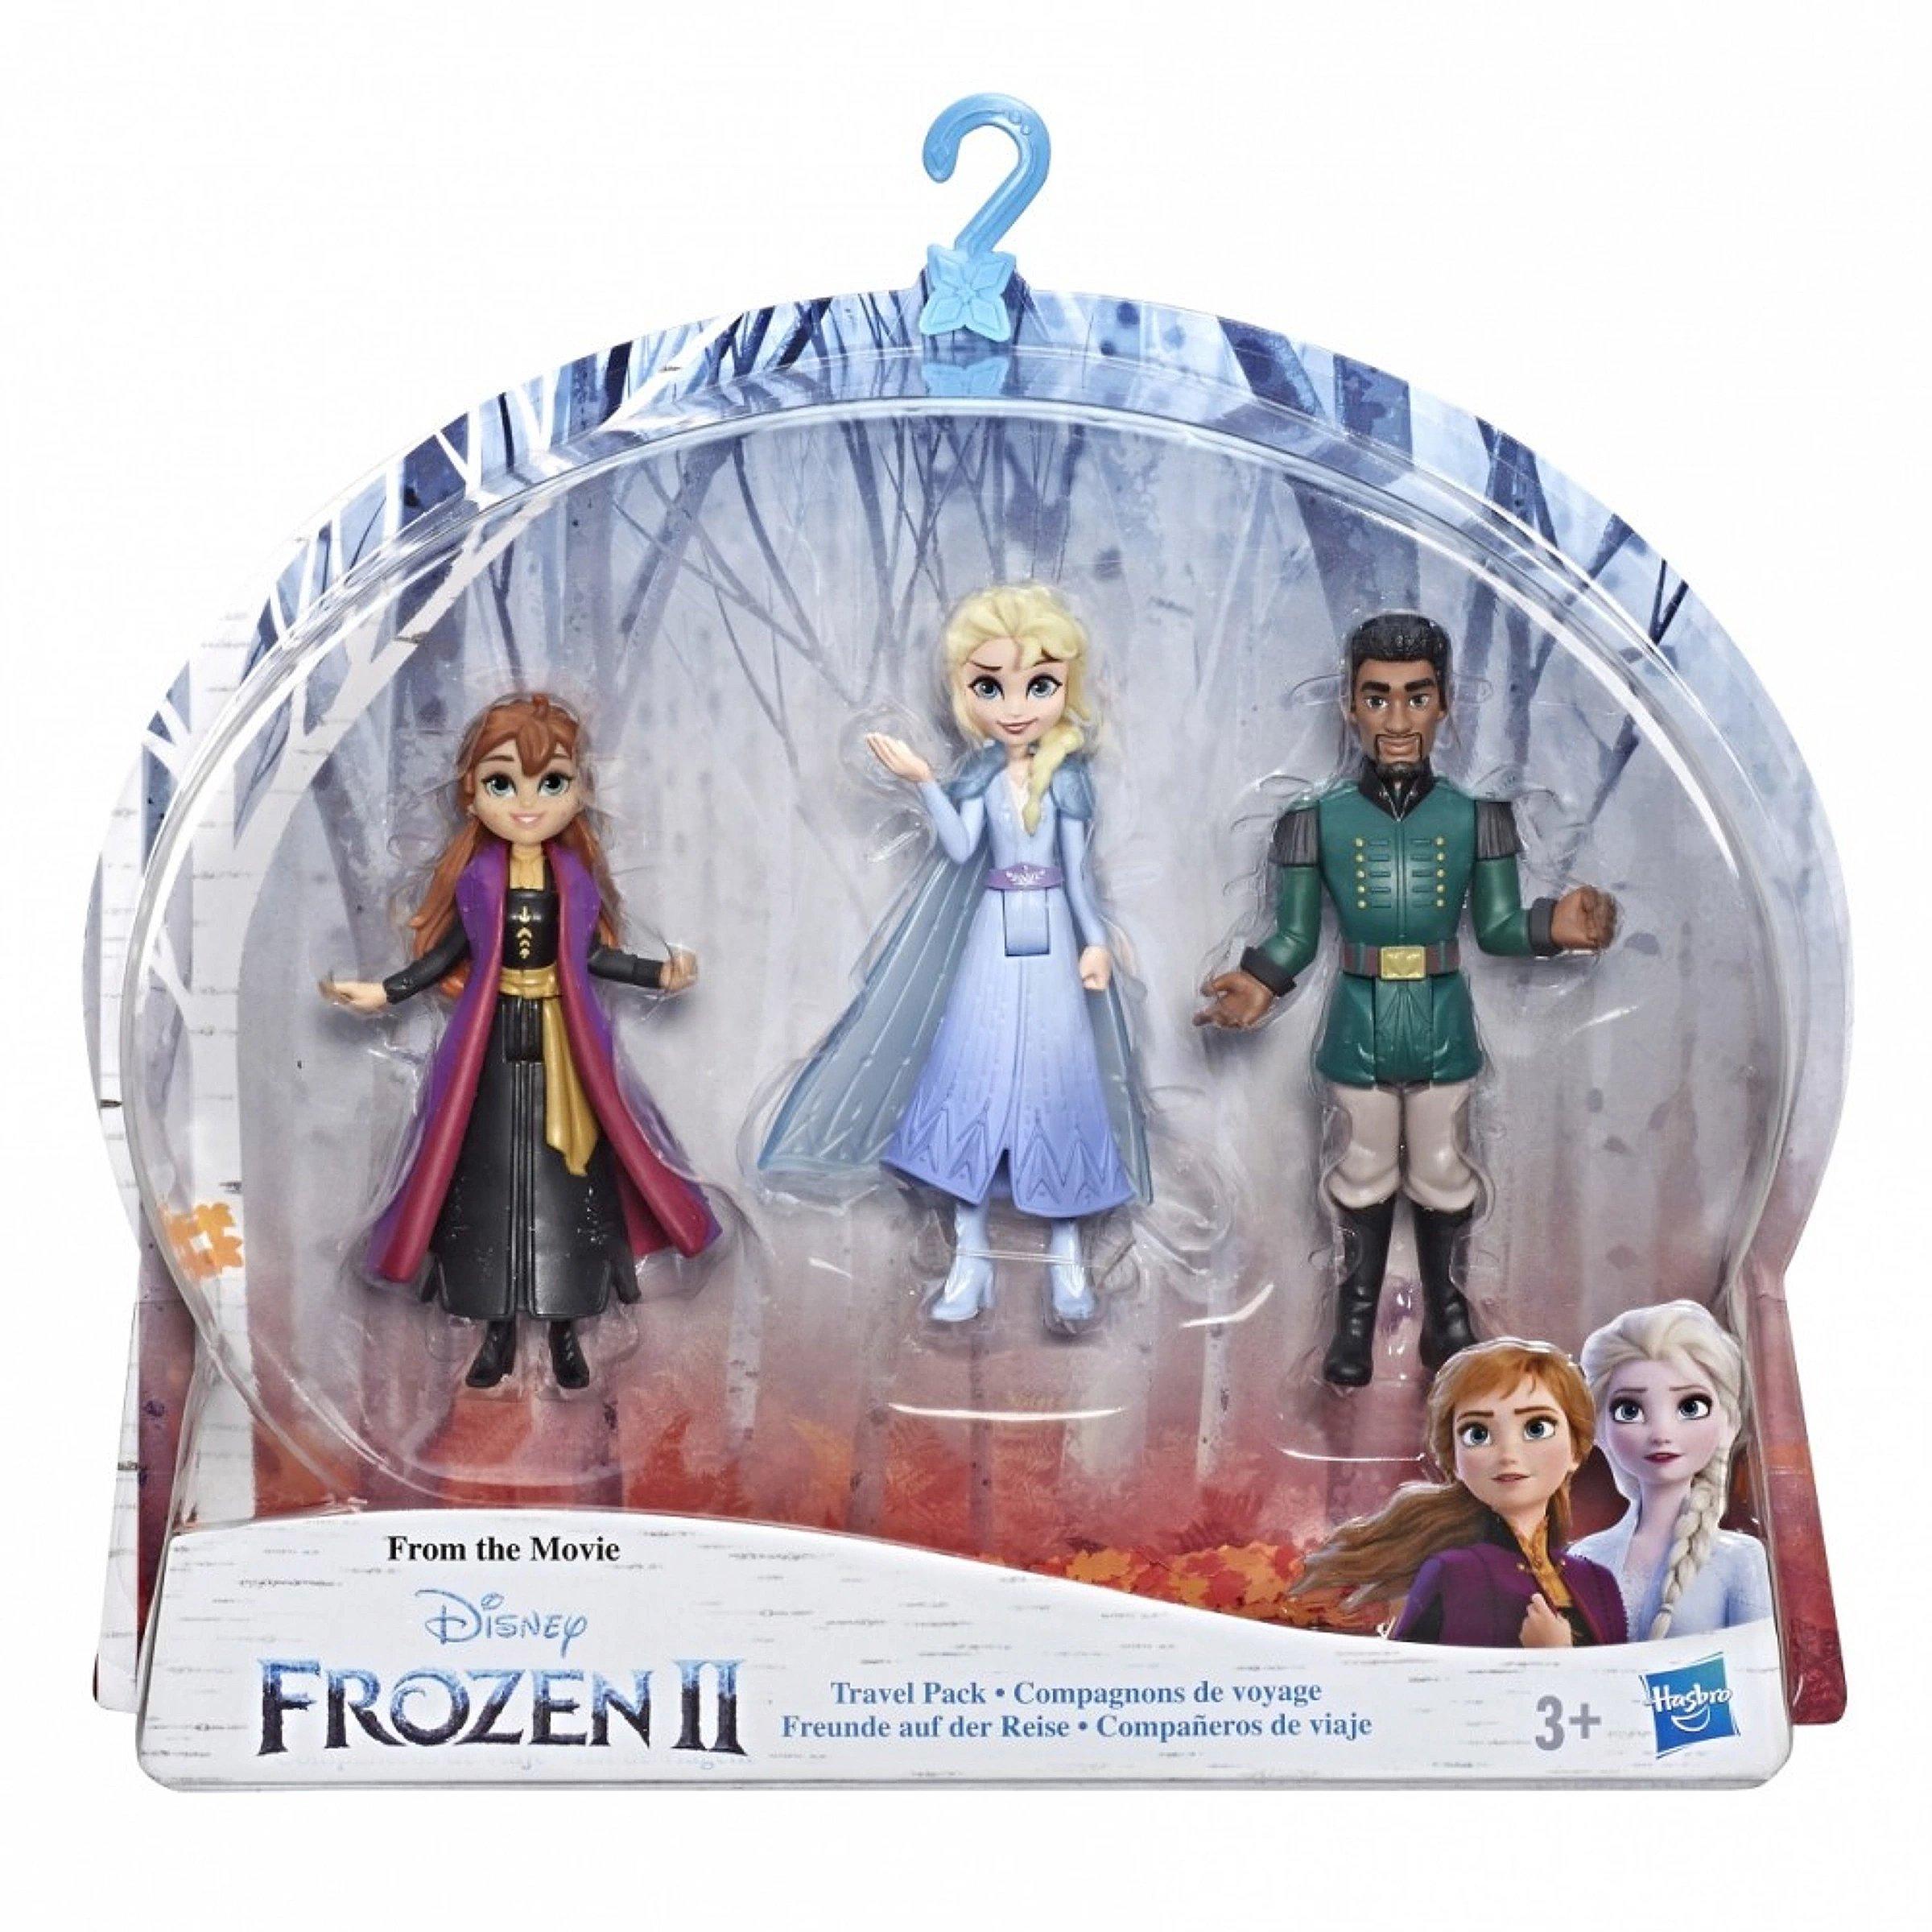 Disney Frozen Anna, Elsa, and Mattias Small Dolls 3-Pack